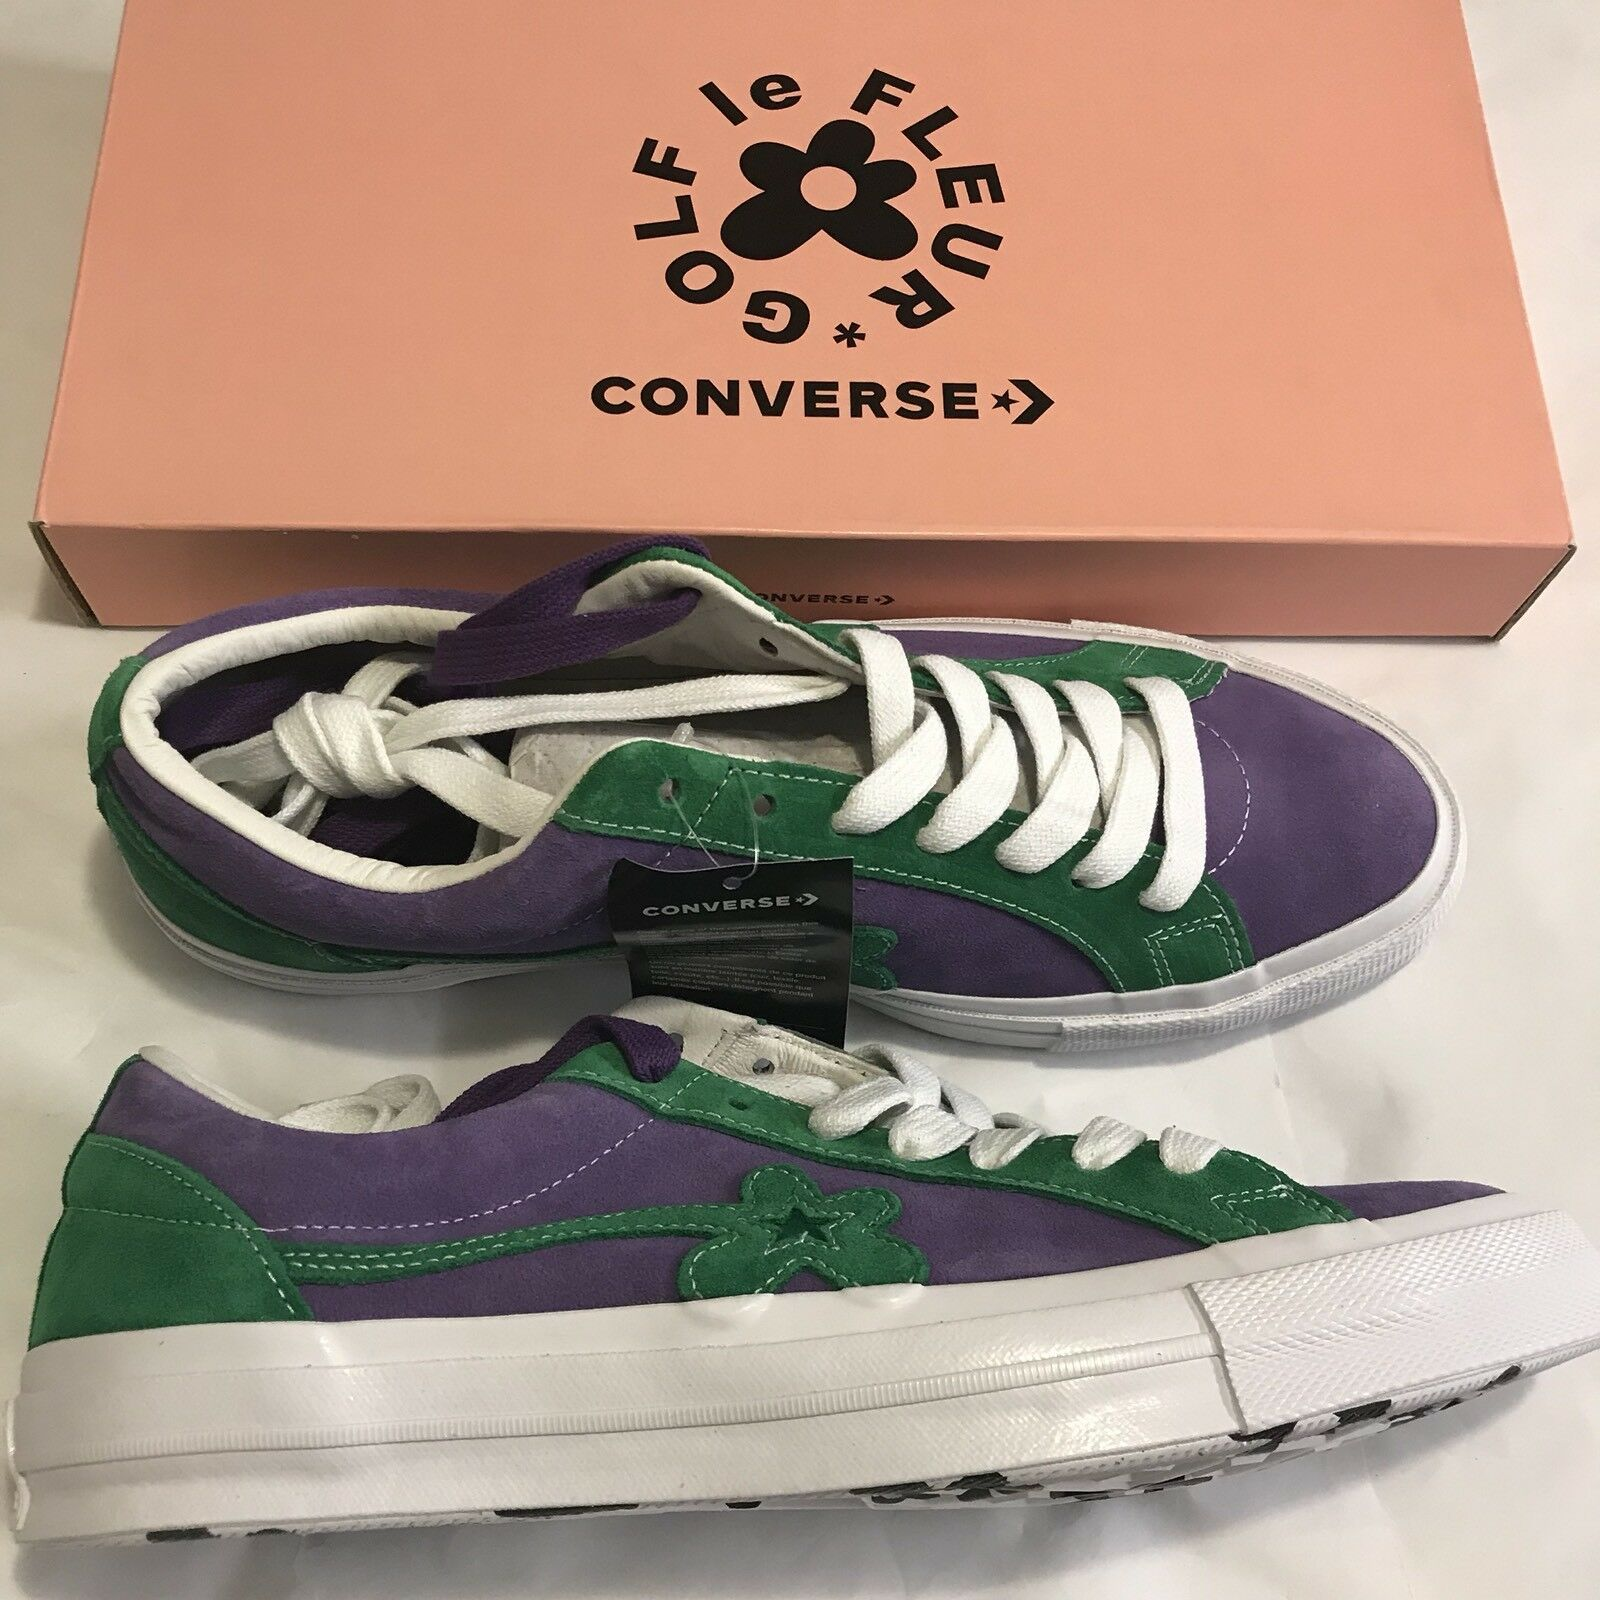 Tyler The Creator x Converse One Star SZ Golf Le Fleur SZ Star 12 Purple Green d367ce